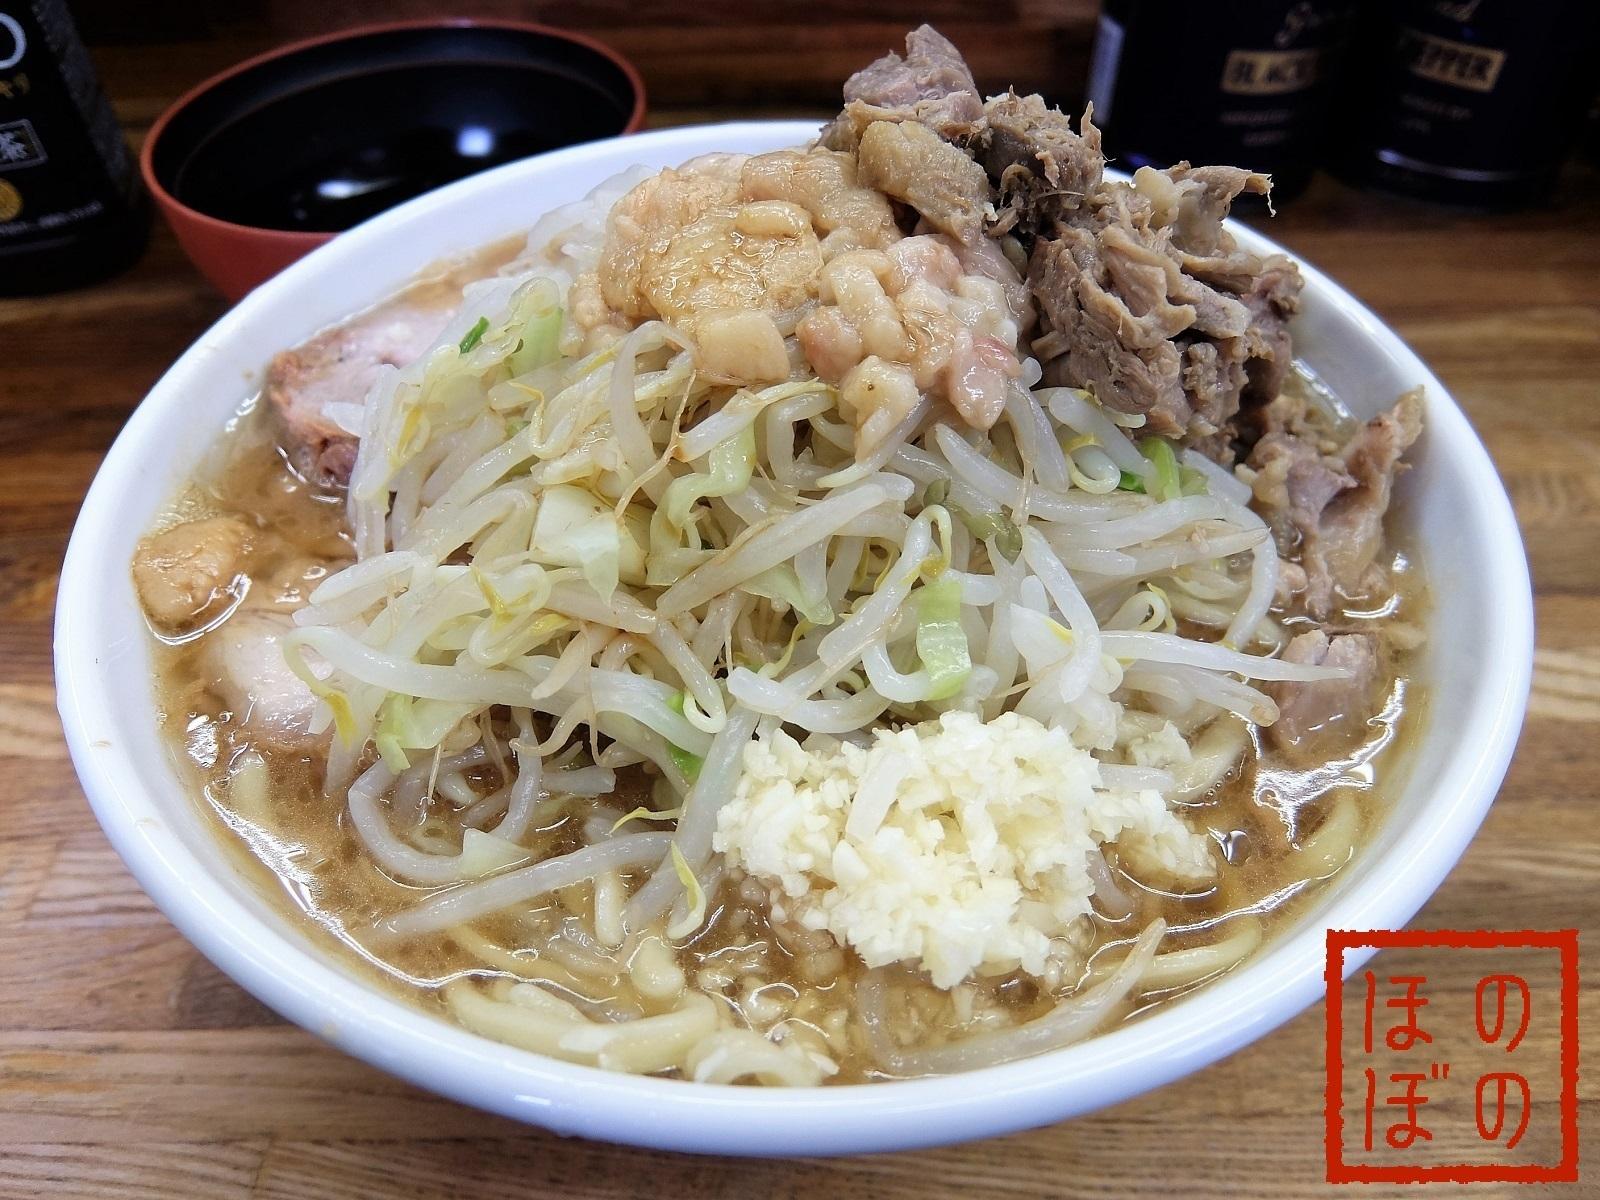 koganei-jirou6.jpg